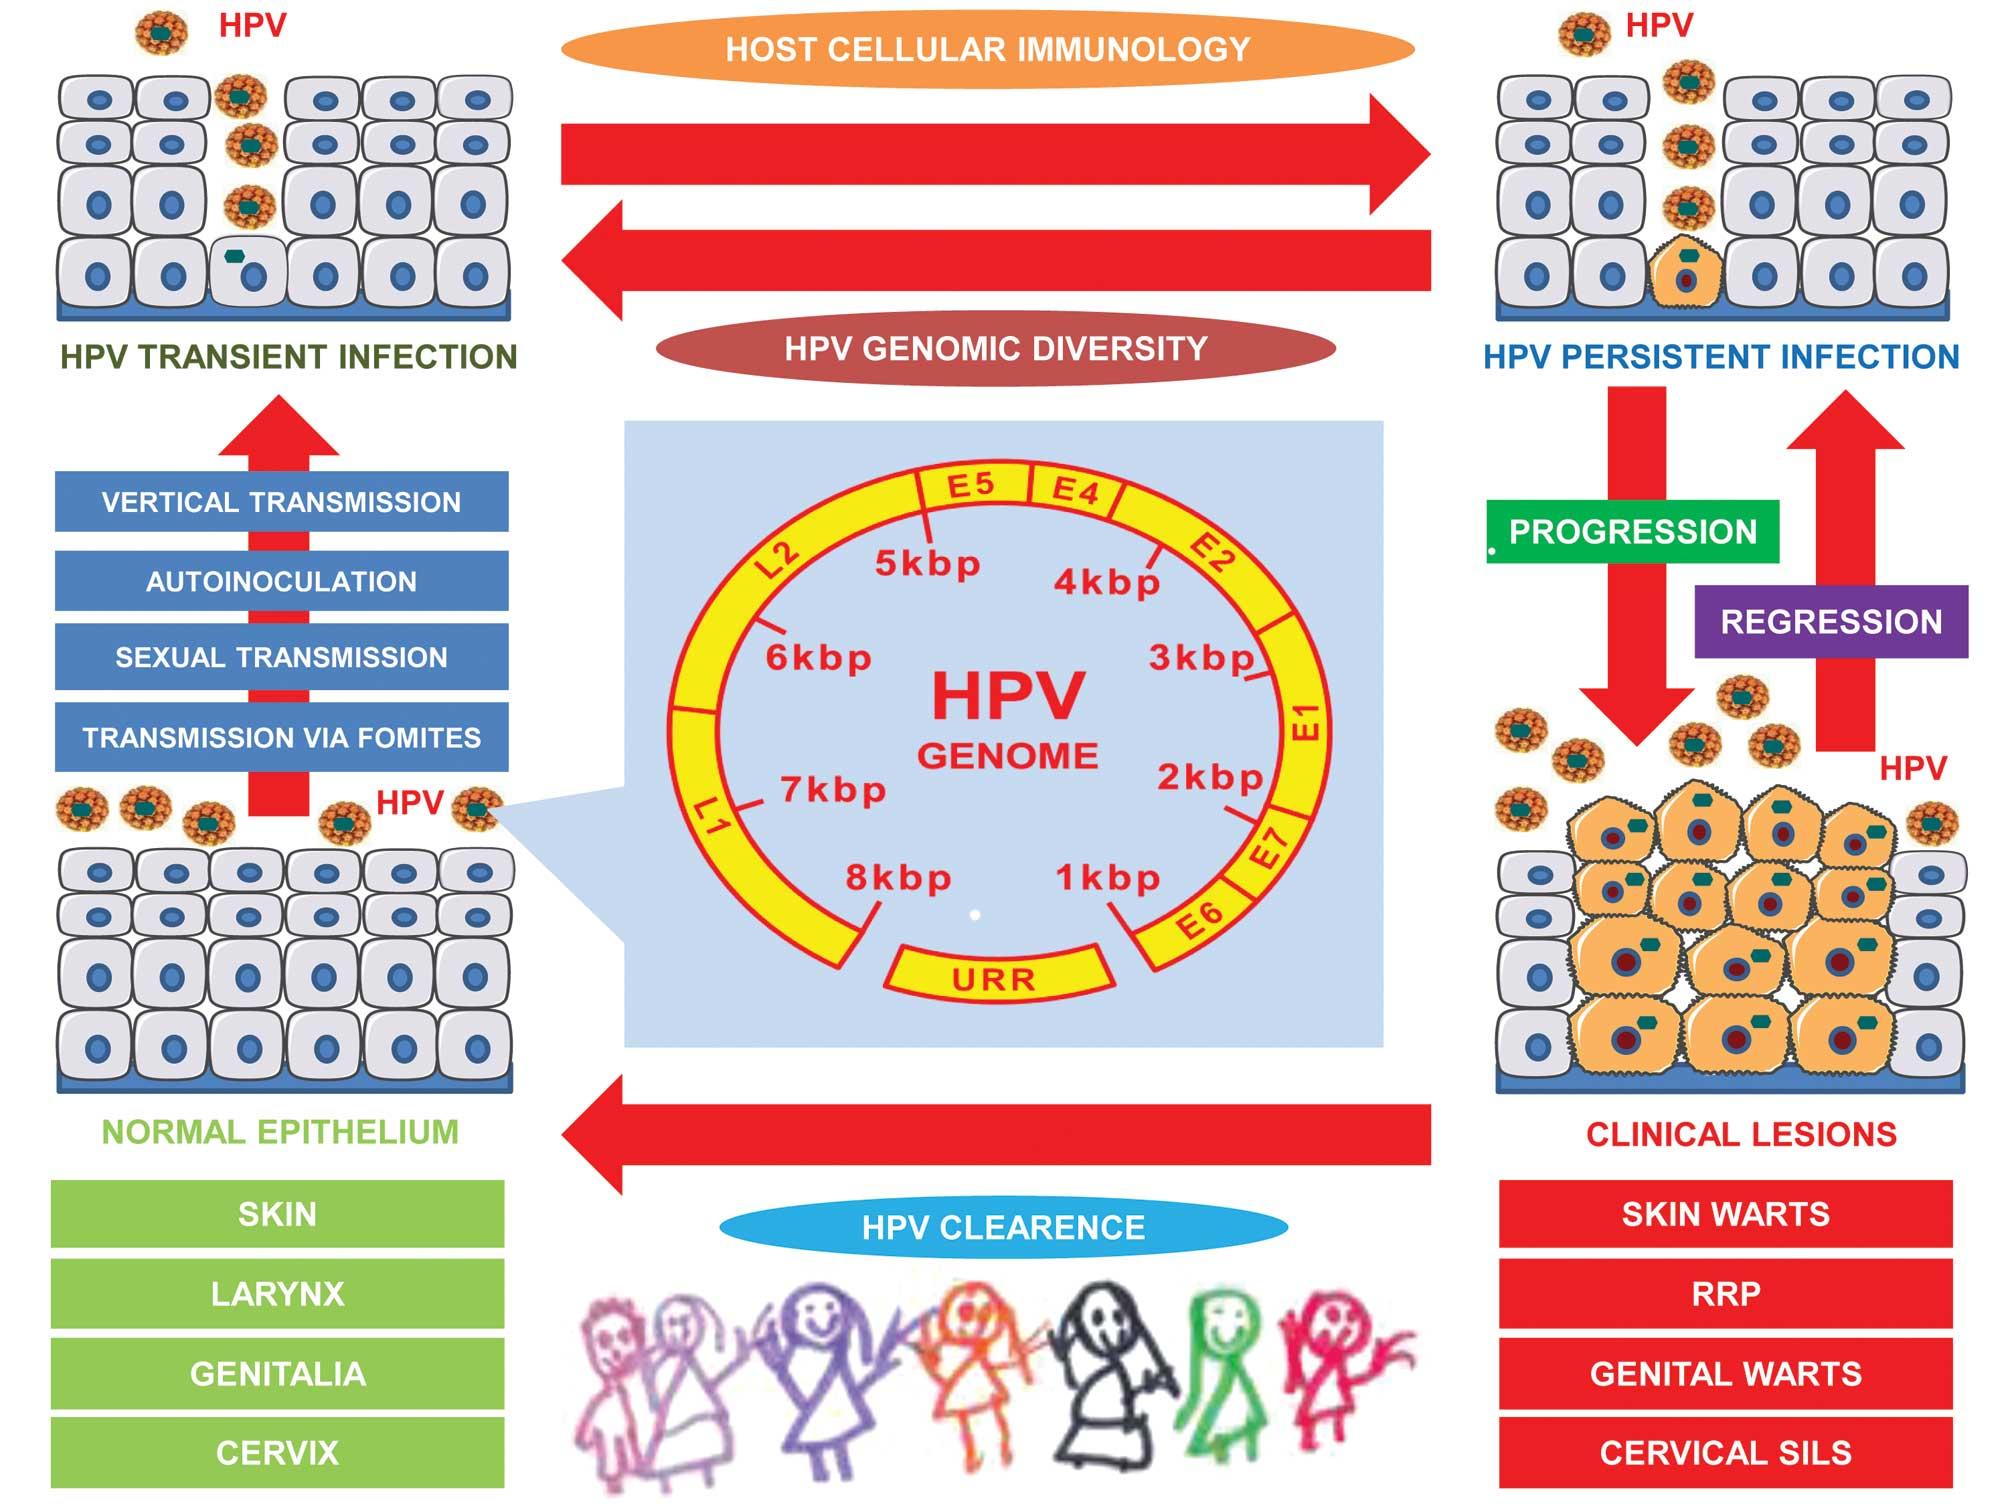 human papillomavirus and transmission